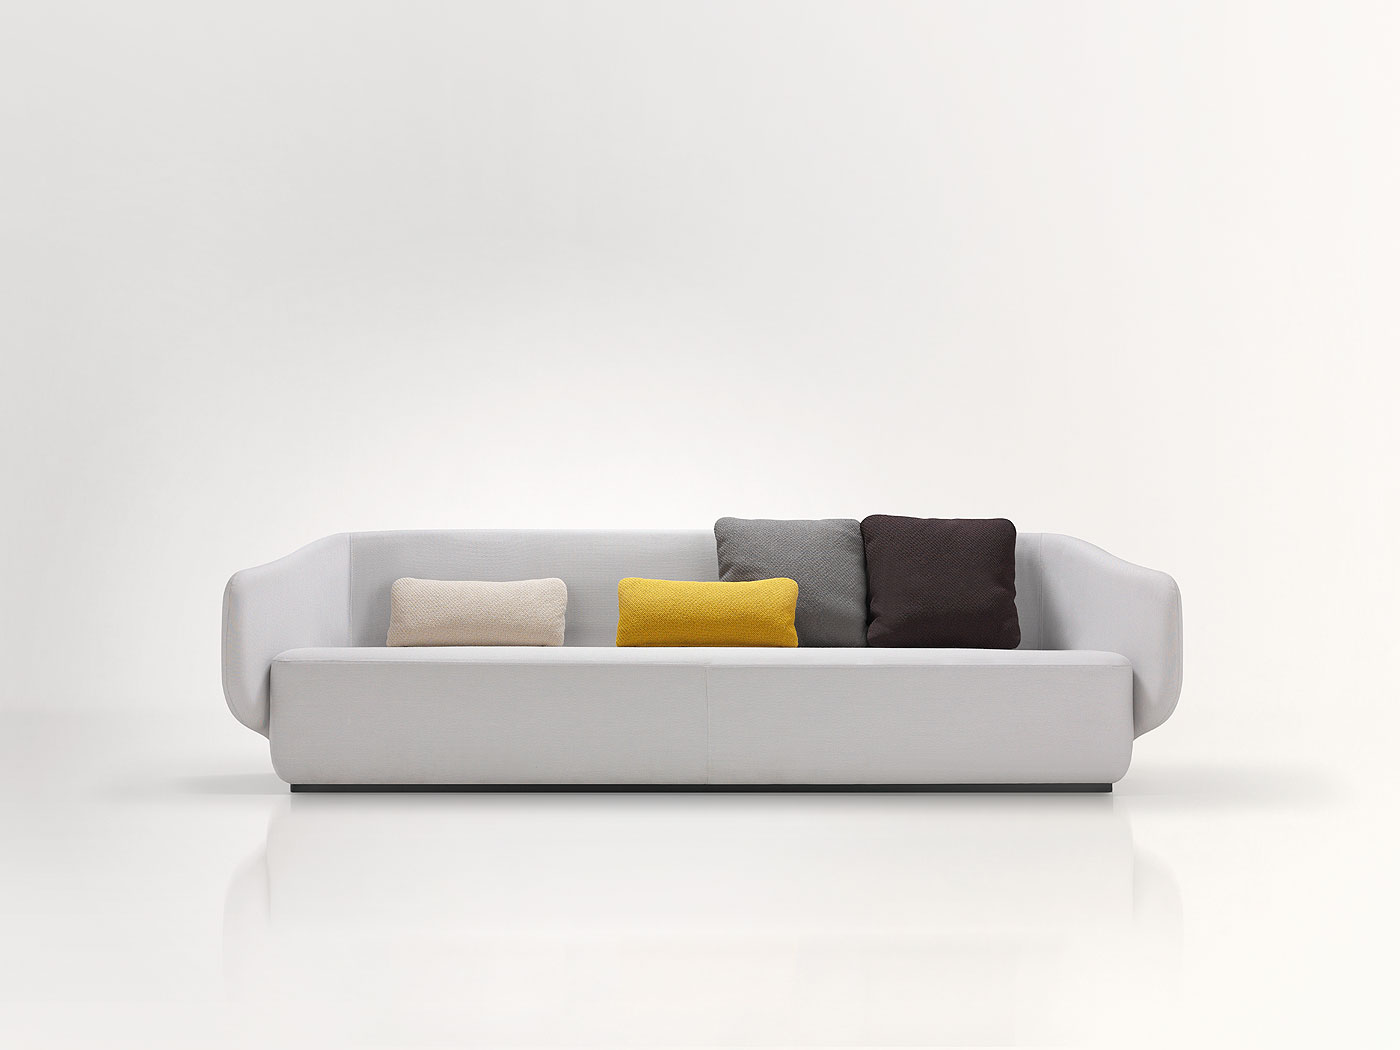 sofa-yon-pau-design-lavernia-cienfuegos (6)